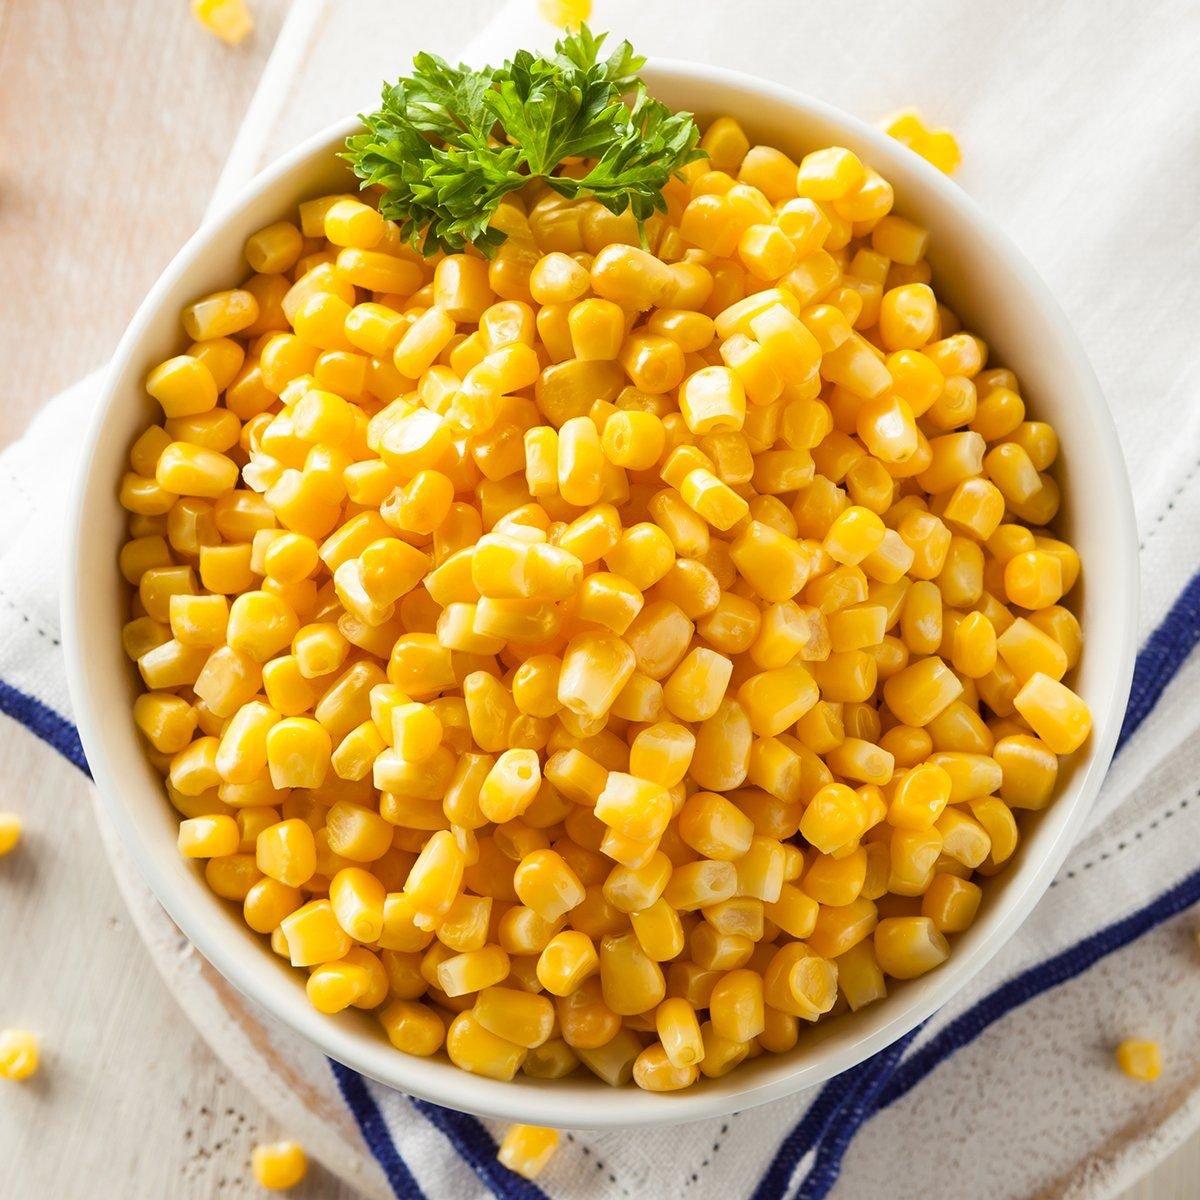 Organic Yellow Steamed Corn in a Bowl; Shutterstock ID 266295782; Job (TFH, TOH, RD, BNB, CWM, CM): TOH